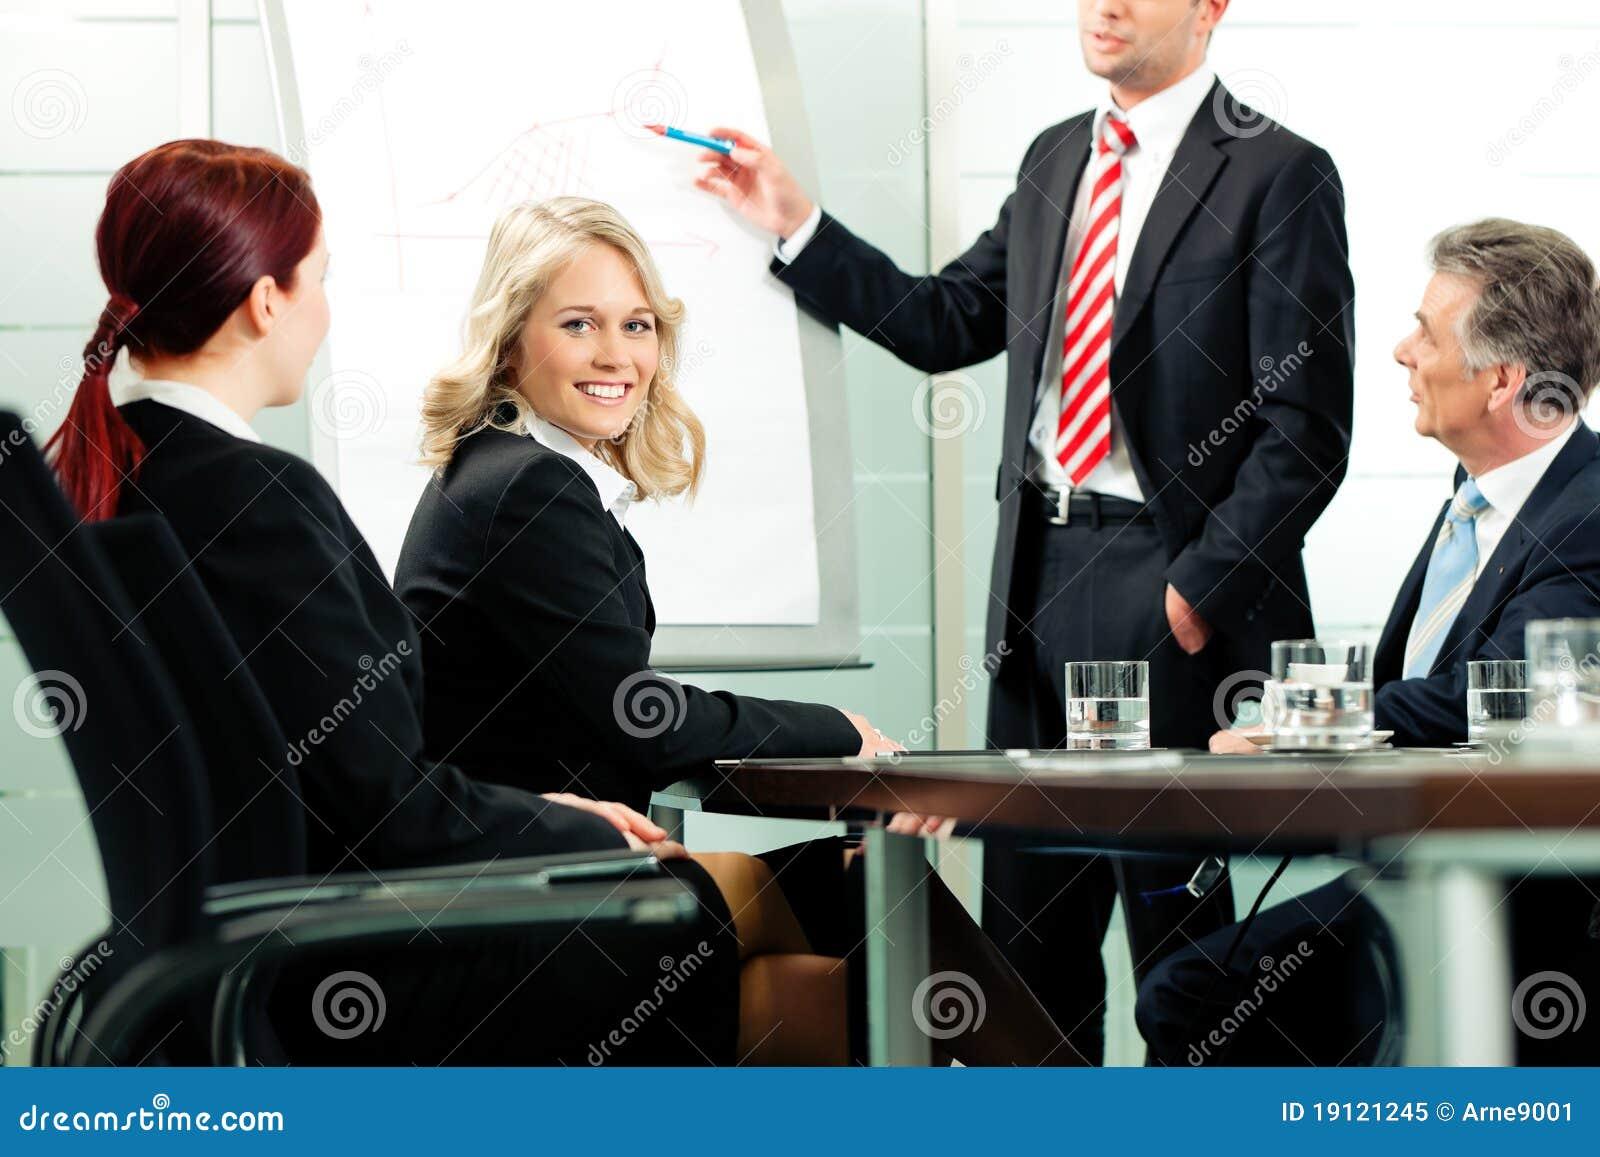 introduction international business presentation